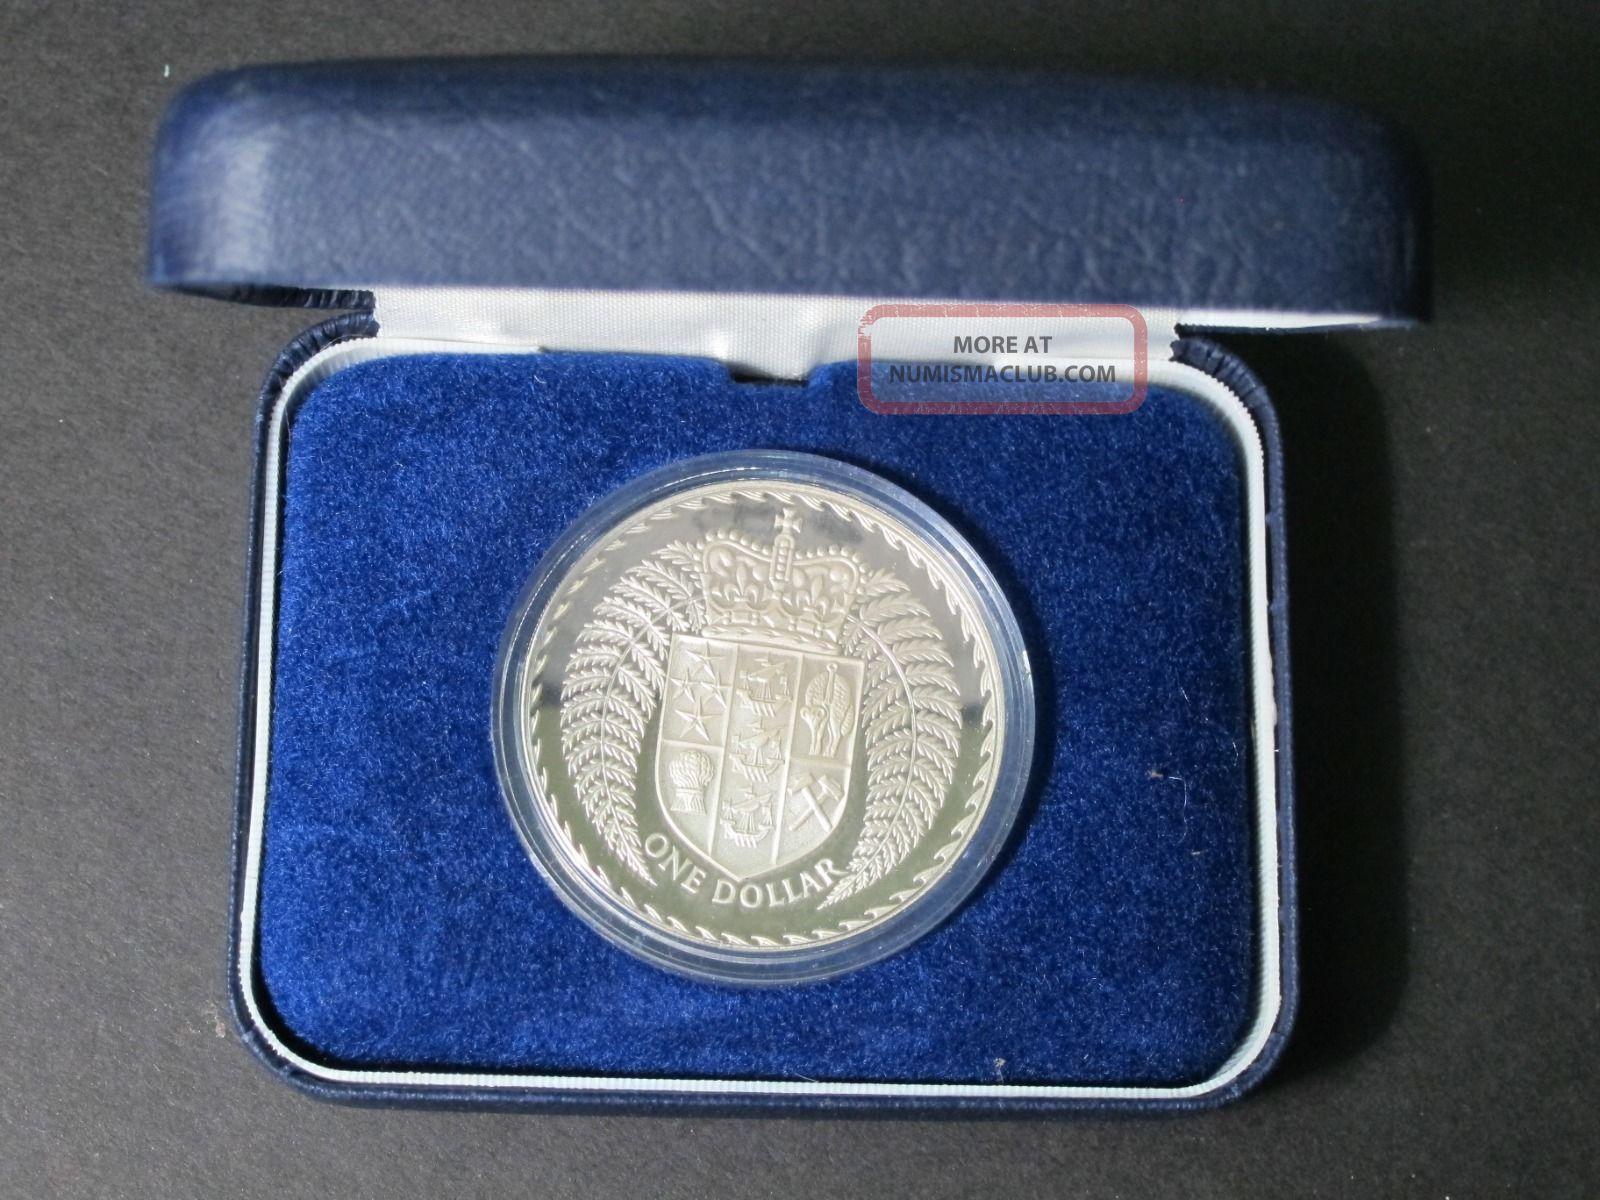 1979 Zealand Proof Silver Dollar $1 Coin In Felt Presentation Case,  Capsule Coins: World photo